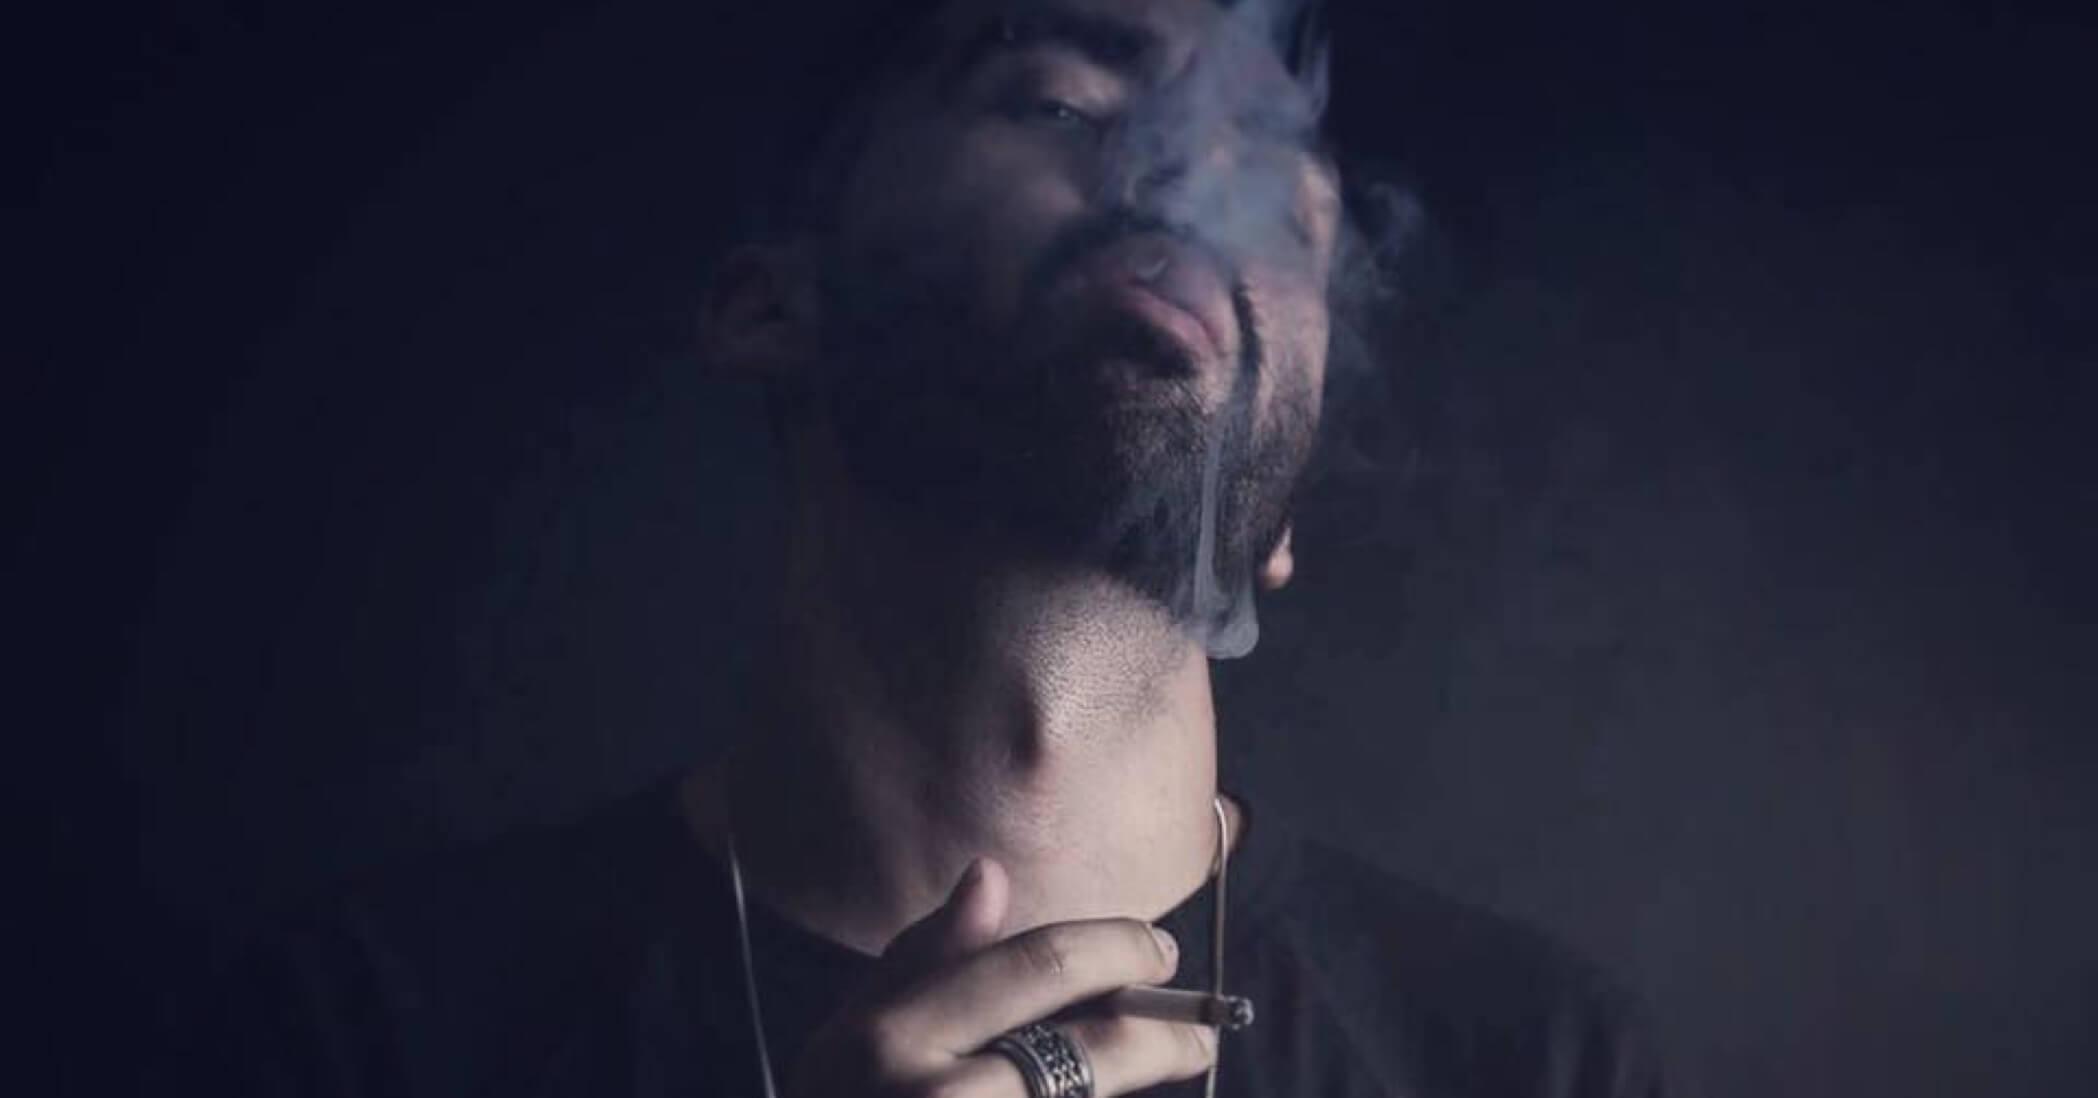 Louie Fresco - Black Wax EP (incl. Bas Ibellini and Shaun Reeves Remixes) hero